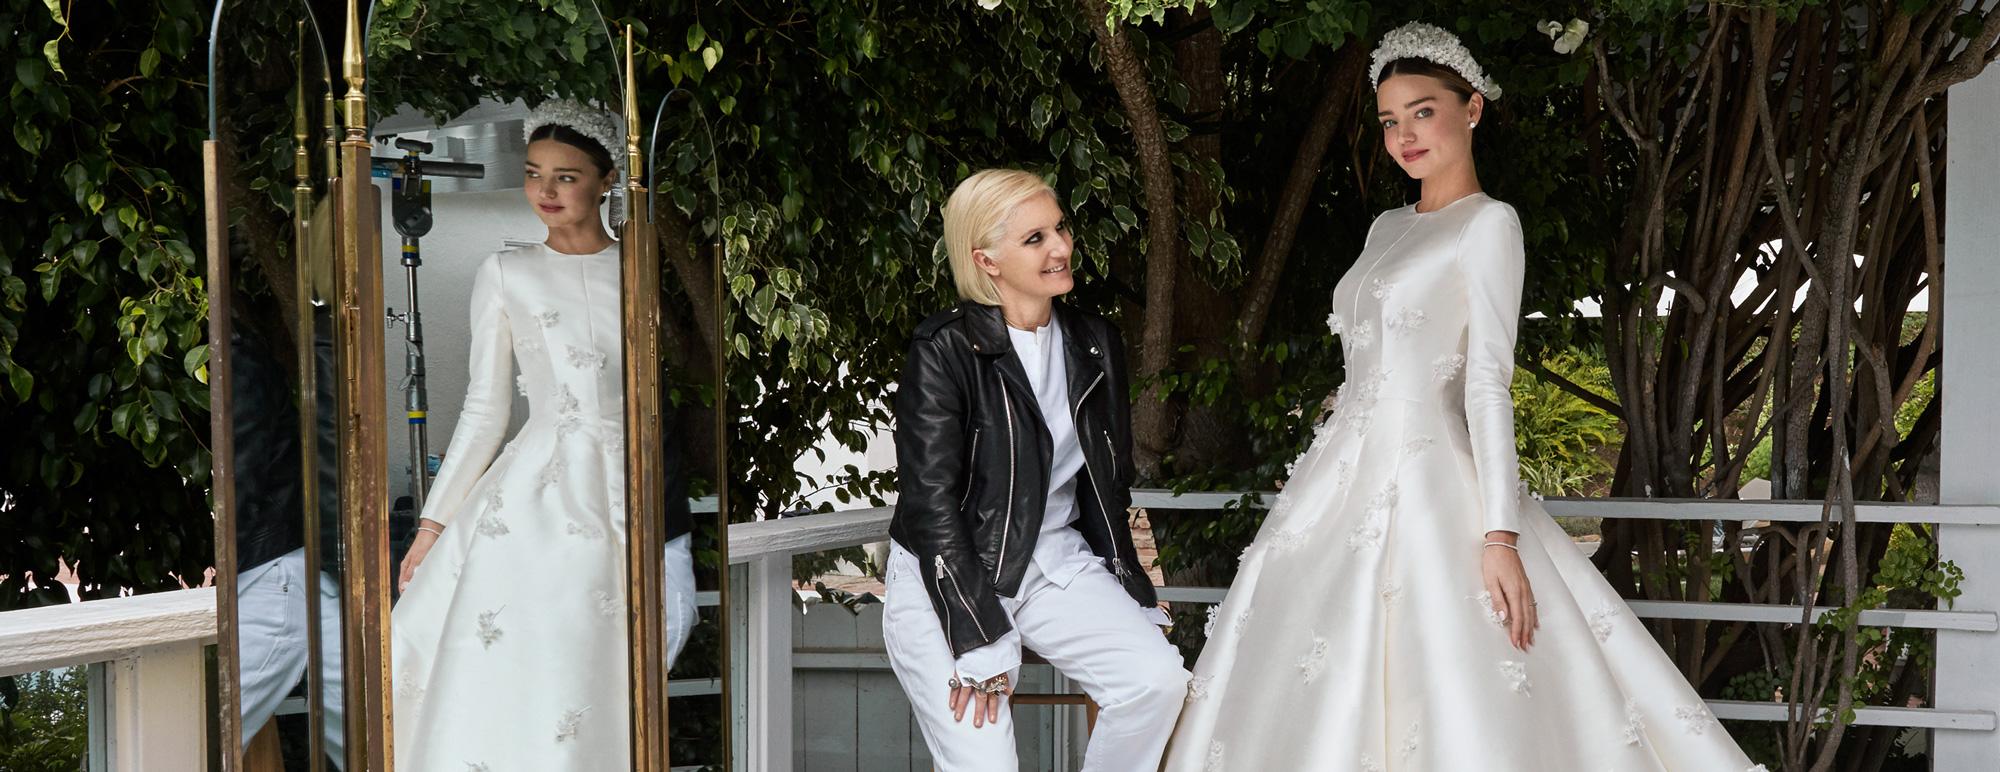 Intip Gaun Pernikahan Dior Pilihan Miranda Kerr